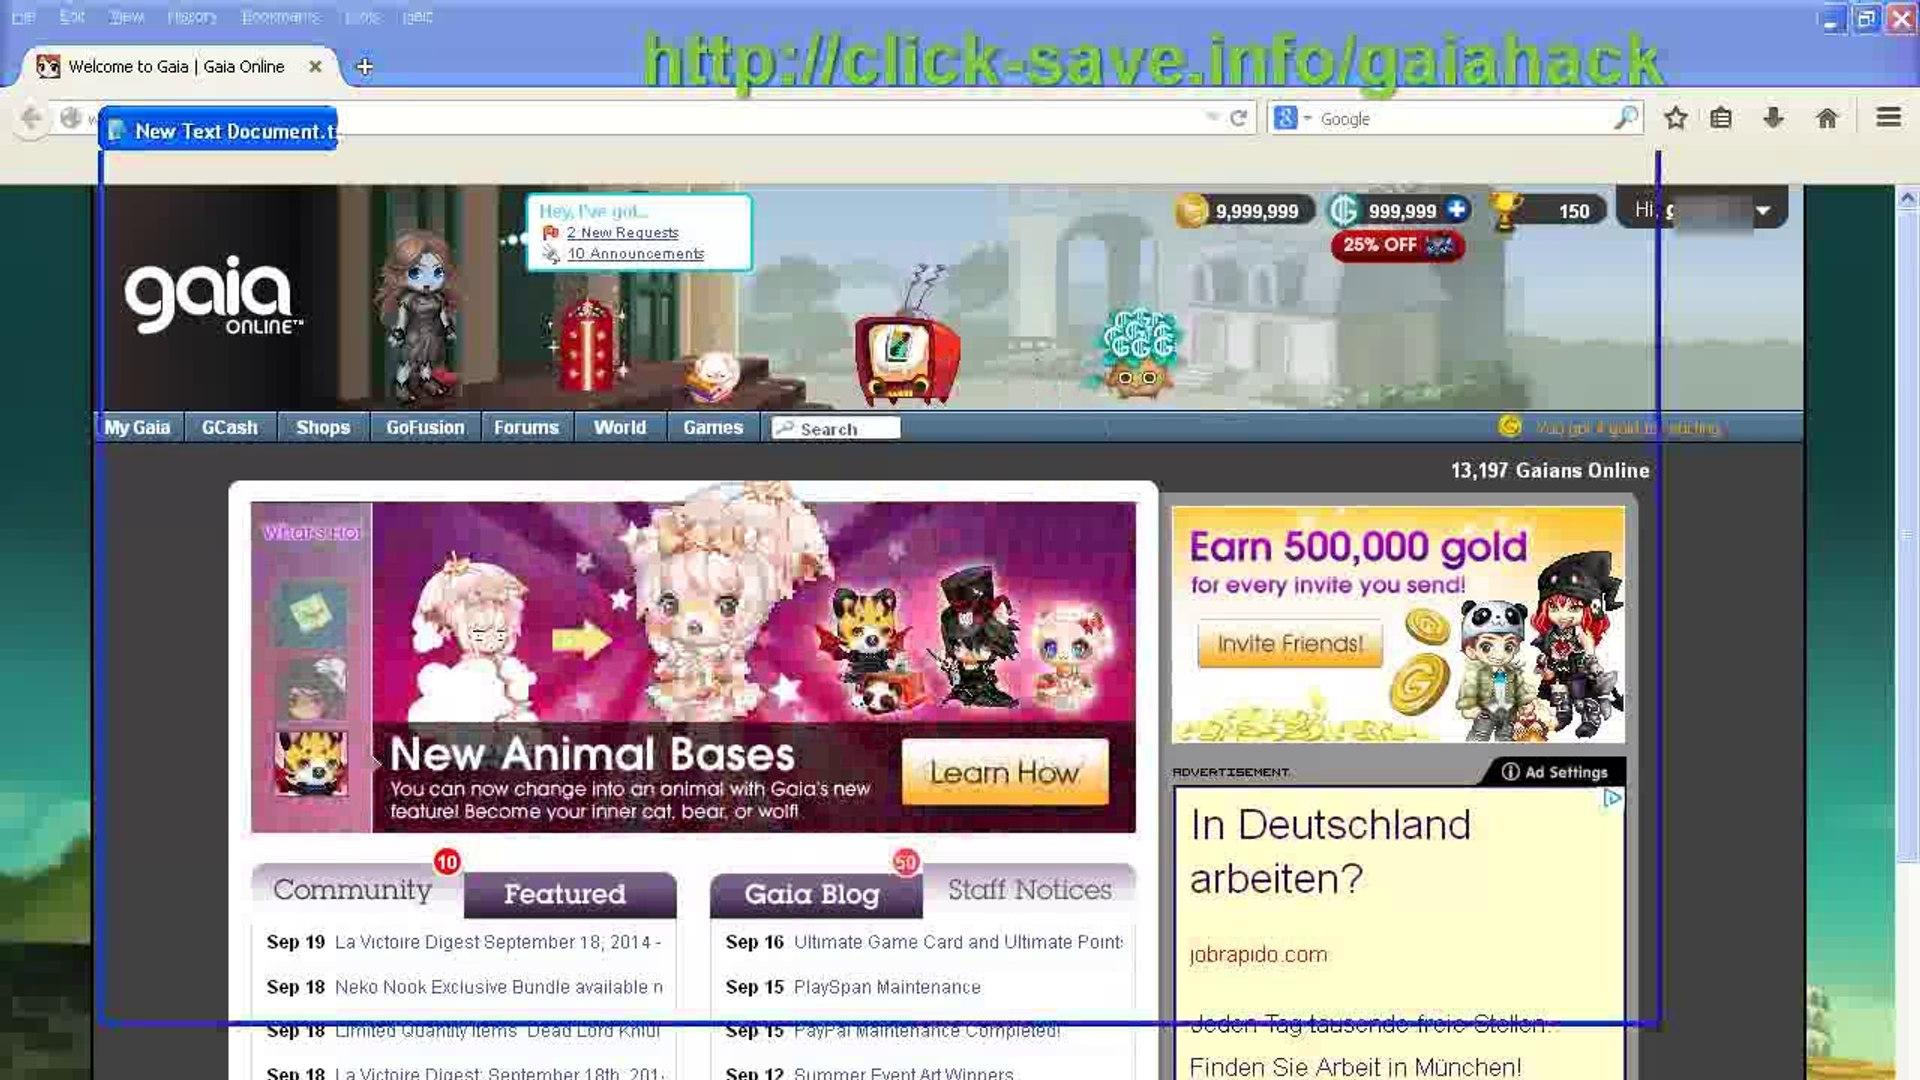 Gaia Online Hack (Unlimited Gold & GCash)